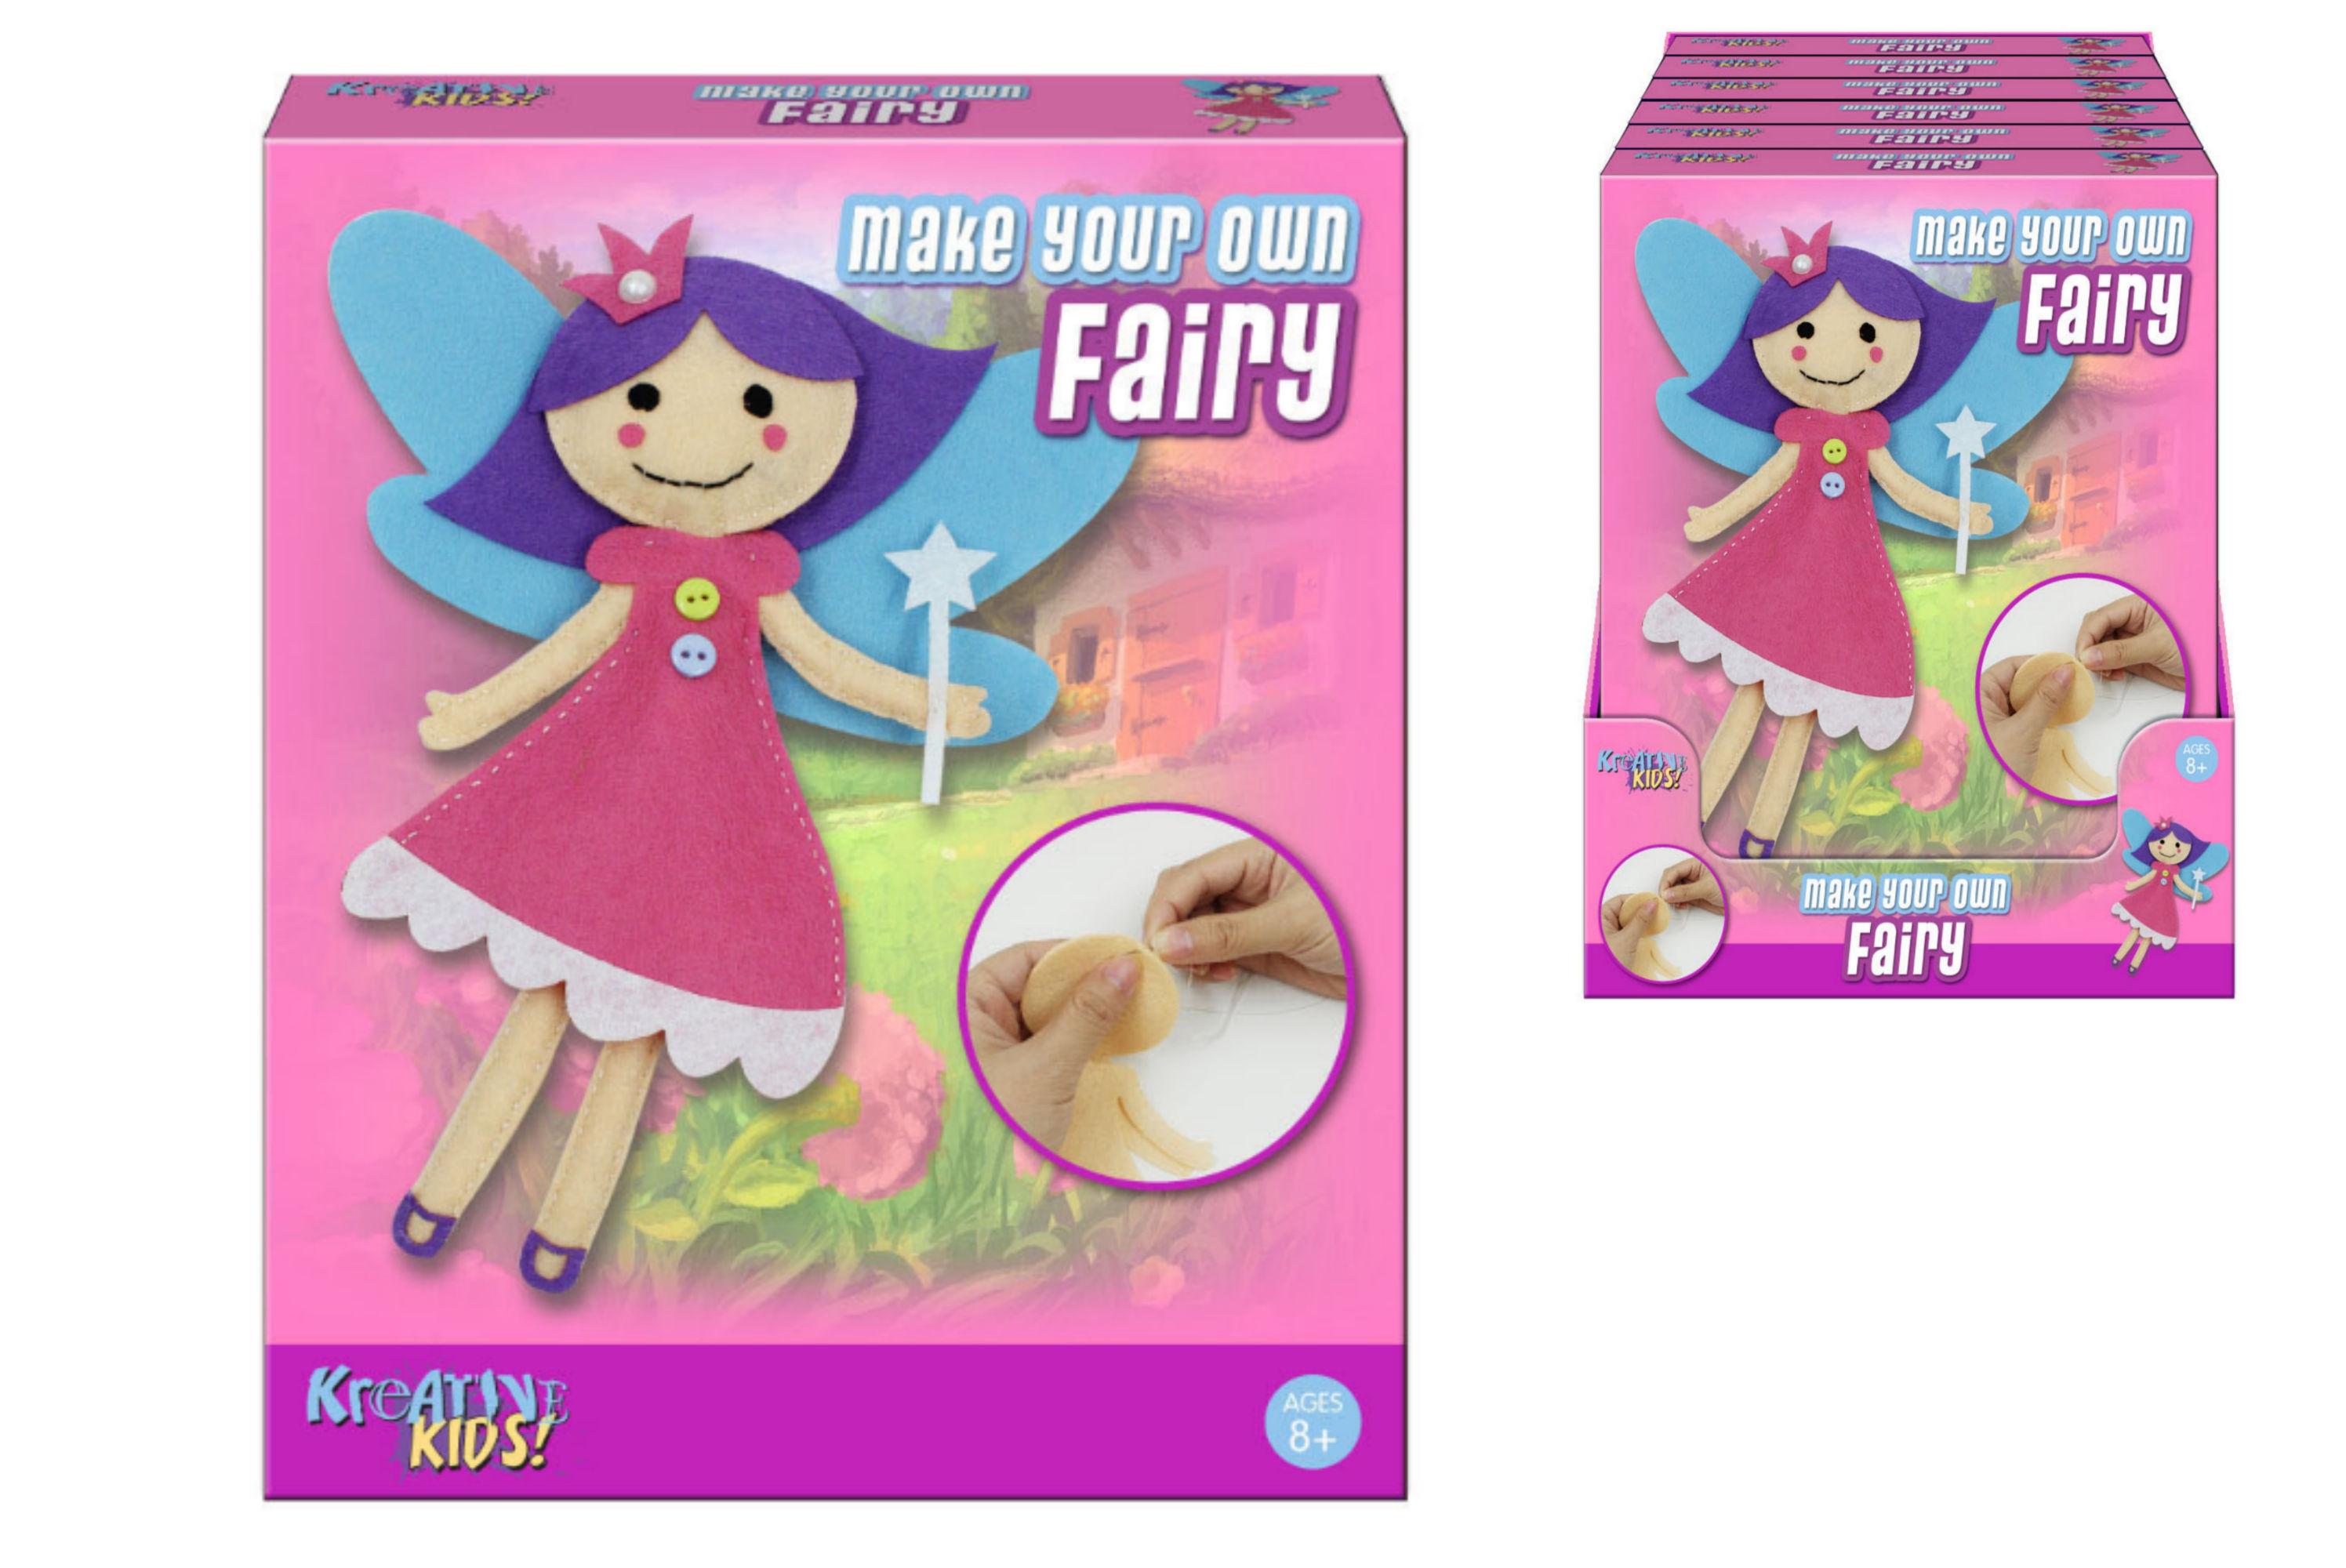 Make Your Own Felt & Stuff Fairy In Colour Box Pdq